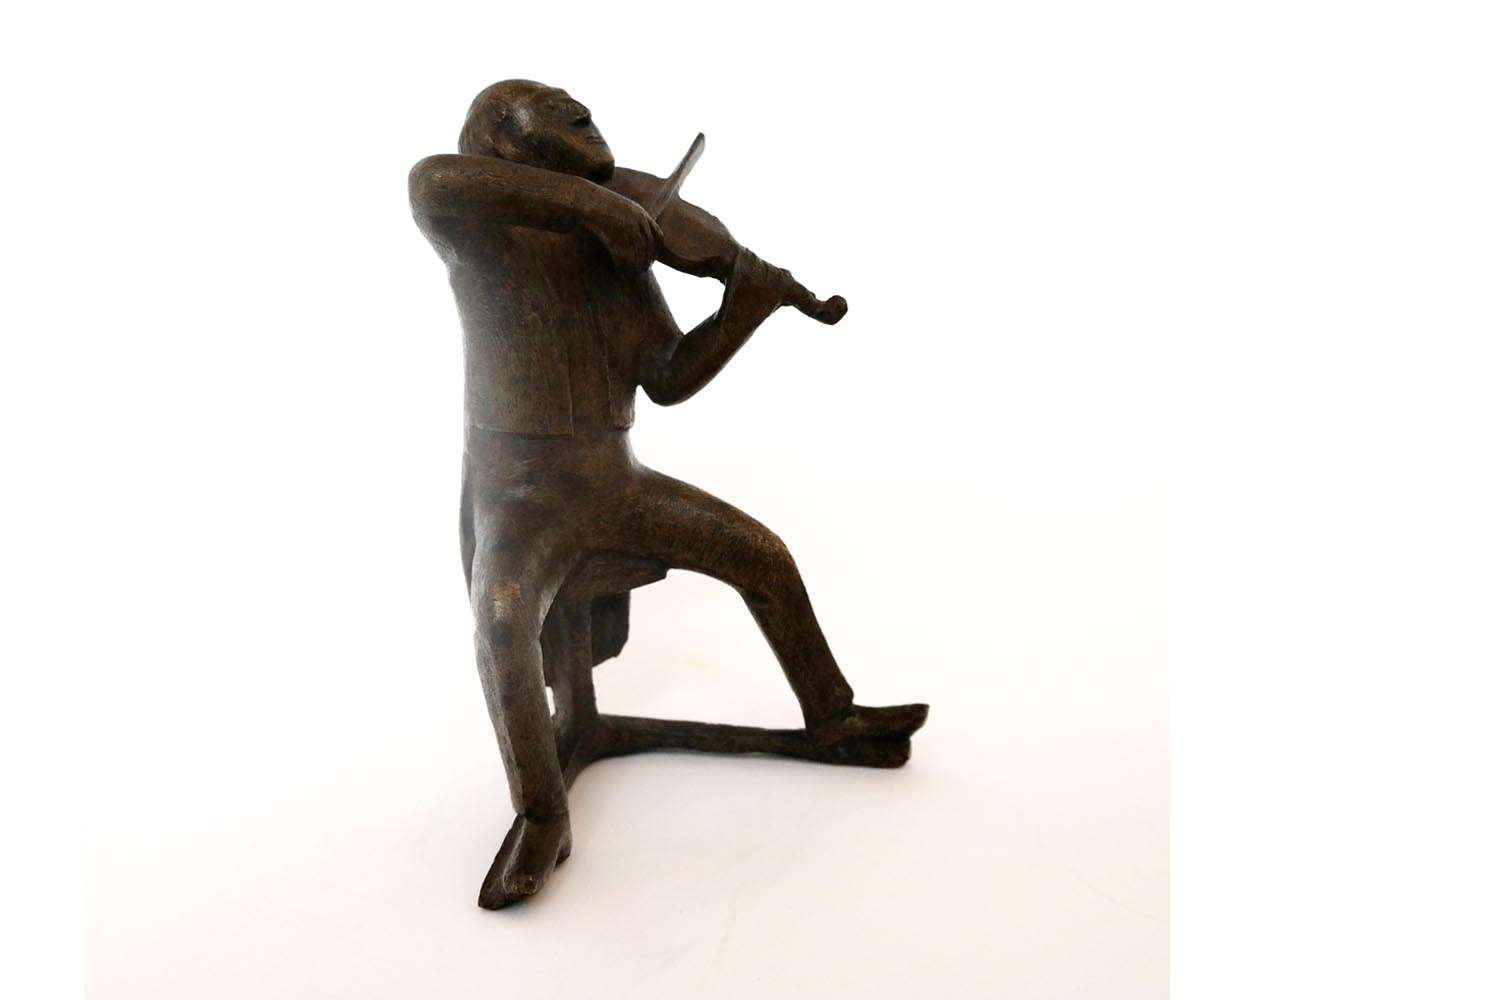 "Gerhard Marcks  "" Sitzender Geiger "" , Bronze 1964, Signum Guss  2 / 10 ,Gießerei Barth , Berlin Marienburg, Rudloff 834, H.25,5 x 18,0 cm, 9.200 €"